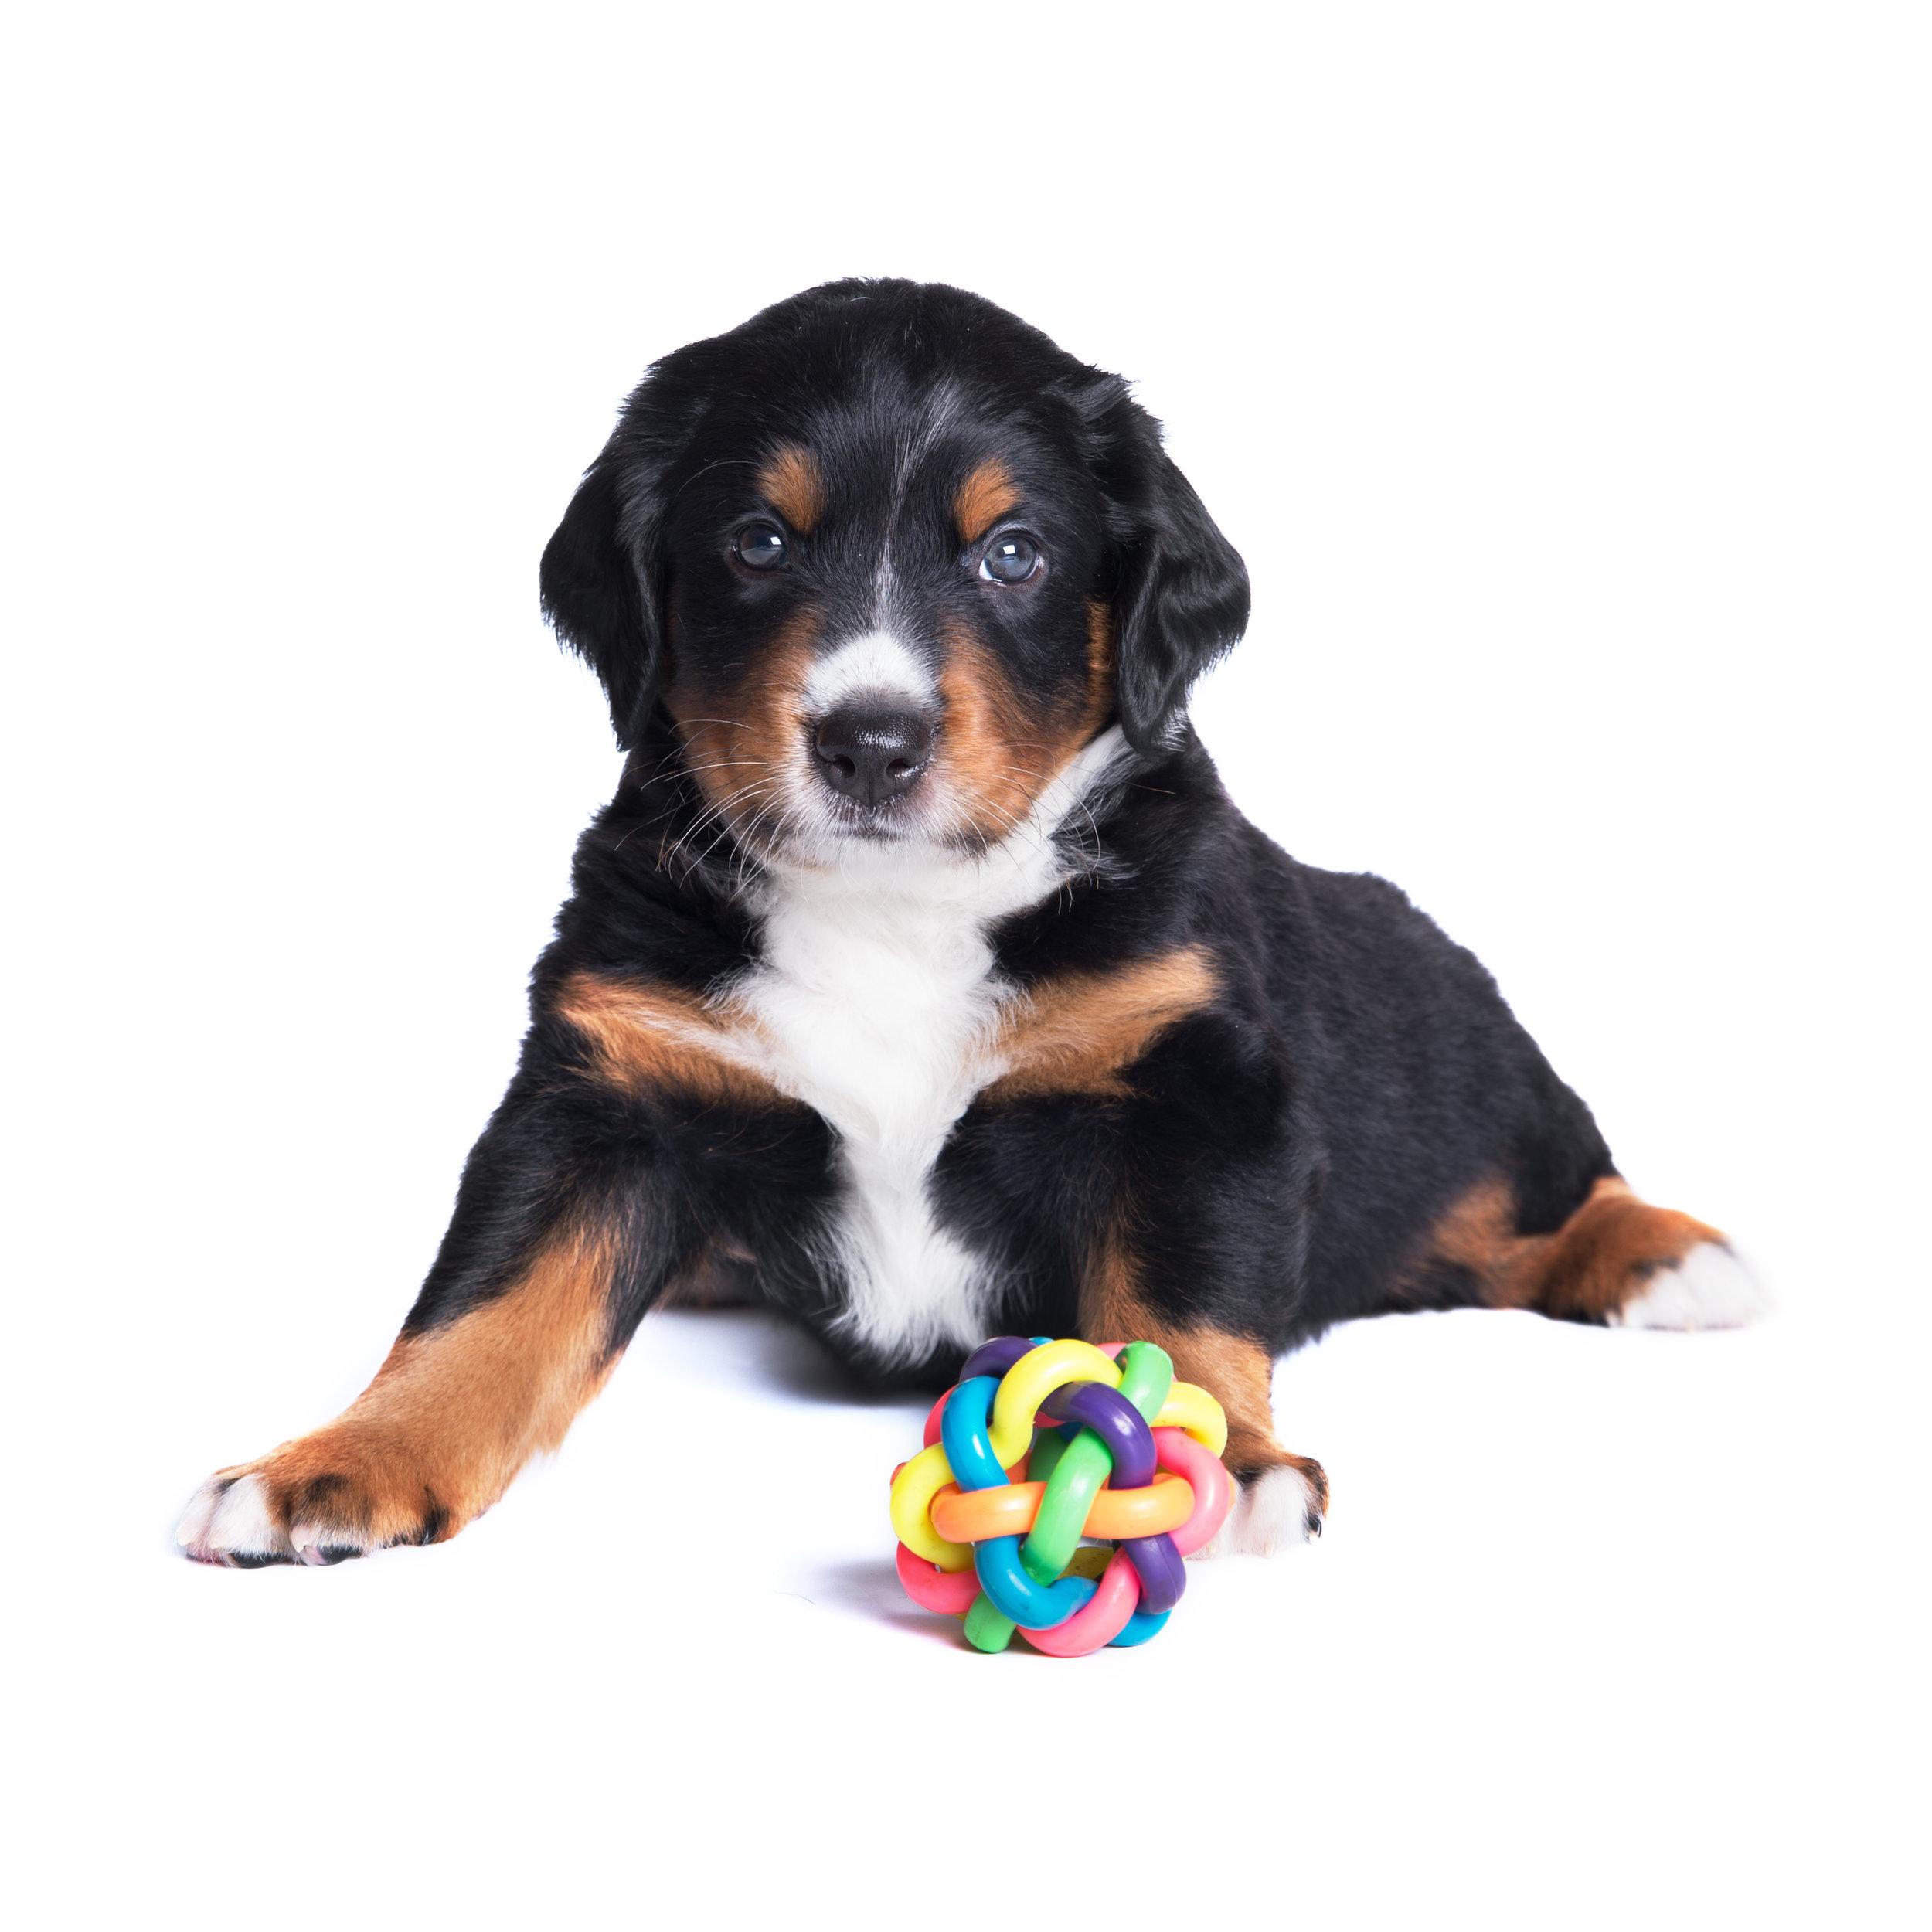 Dog training and behavior seminars for dog owners, including dog aggression, dominance, alpha, potty training, dog biting.